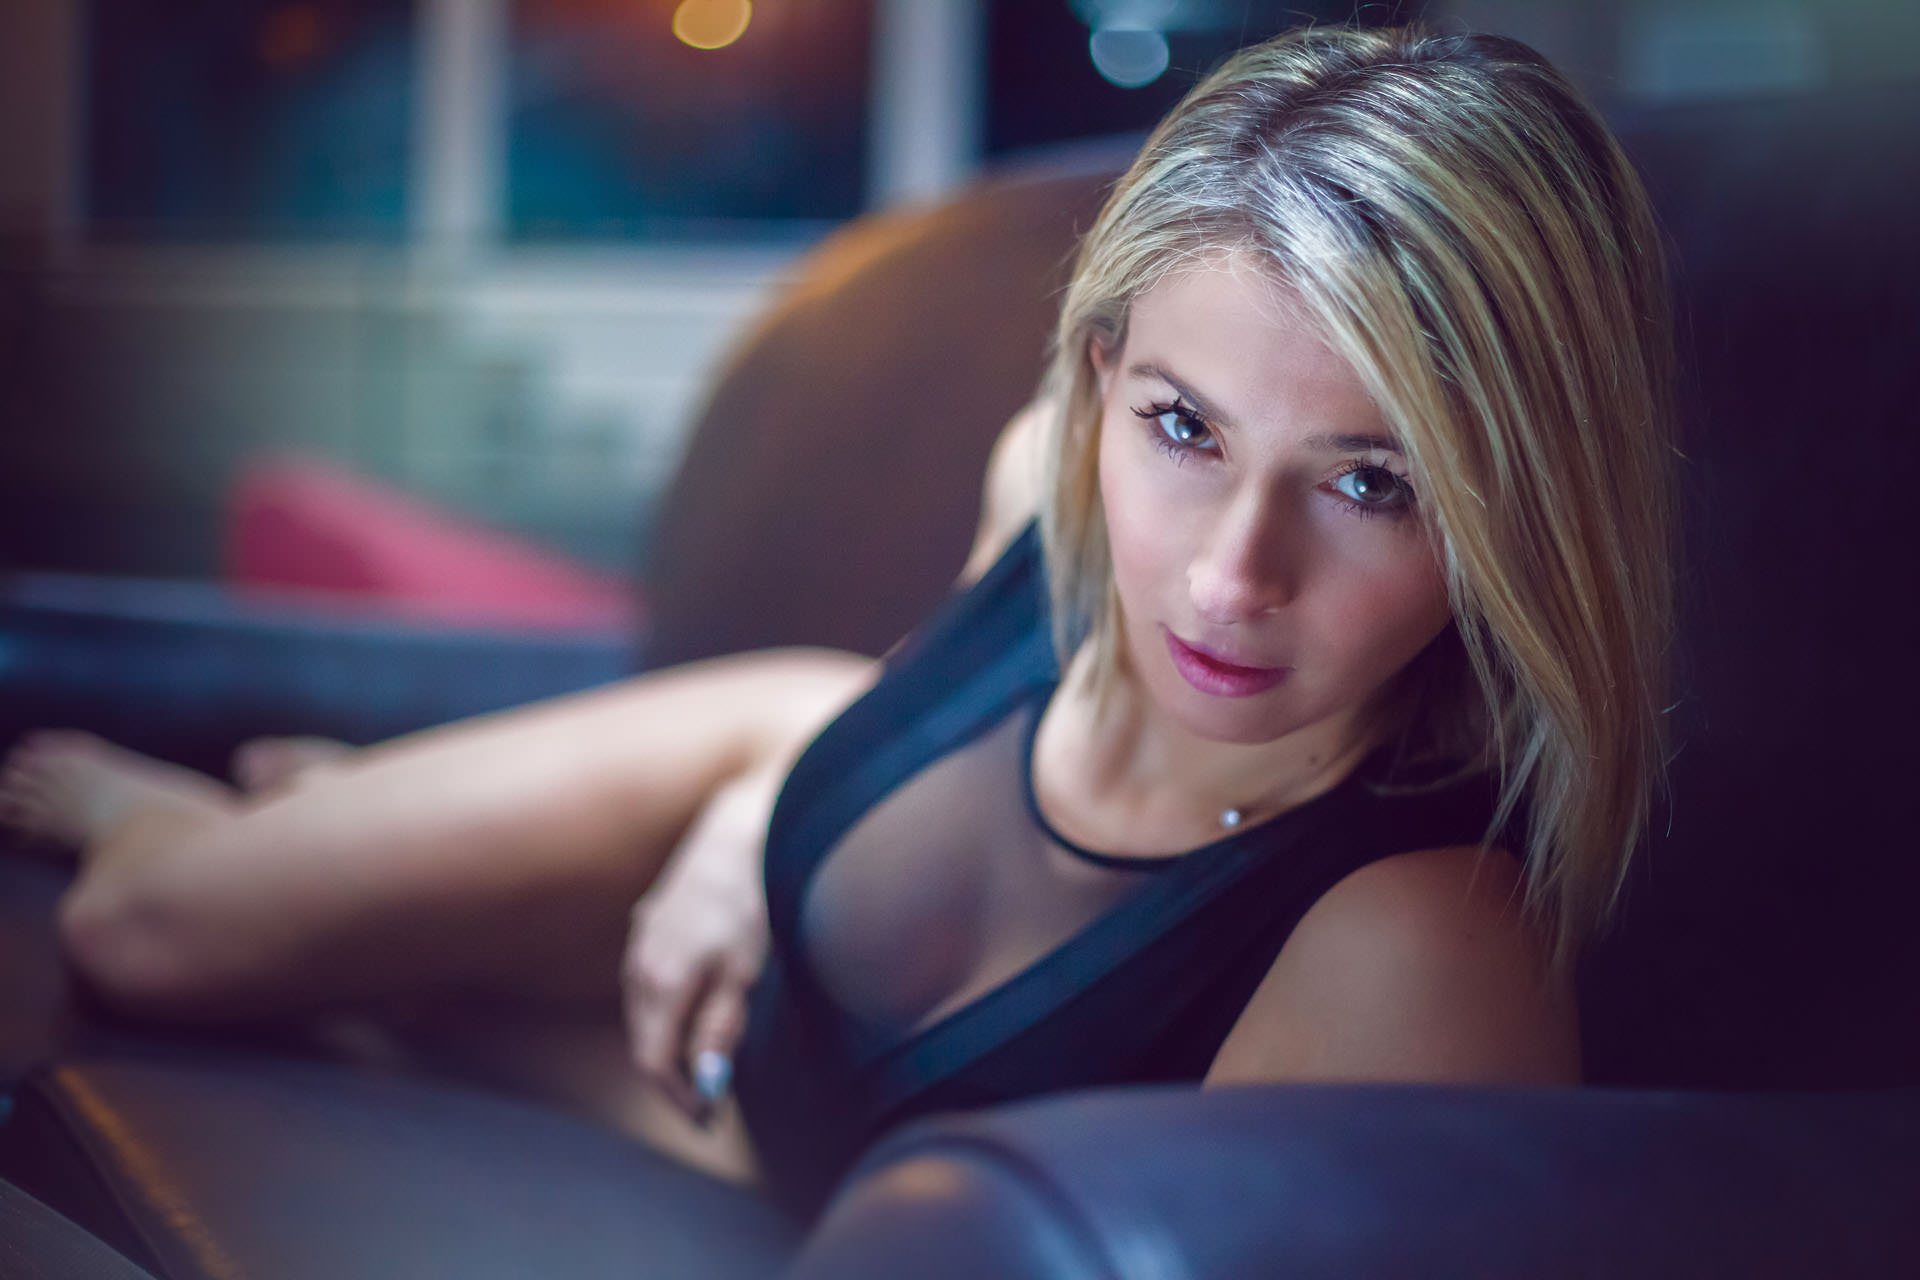 2017-03-02 - Jess Combes - ParadiForm - 3597 - 1920px